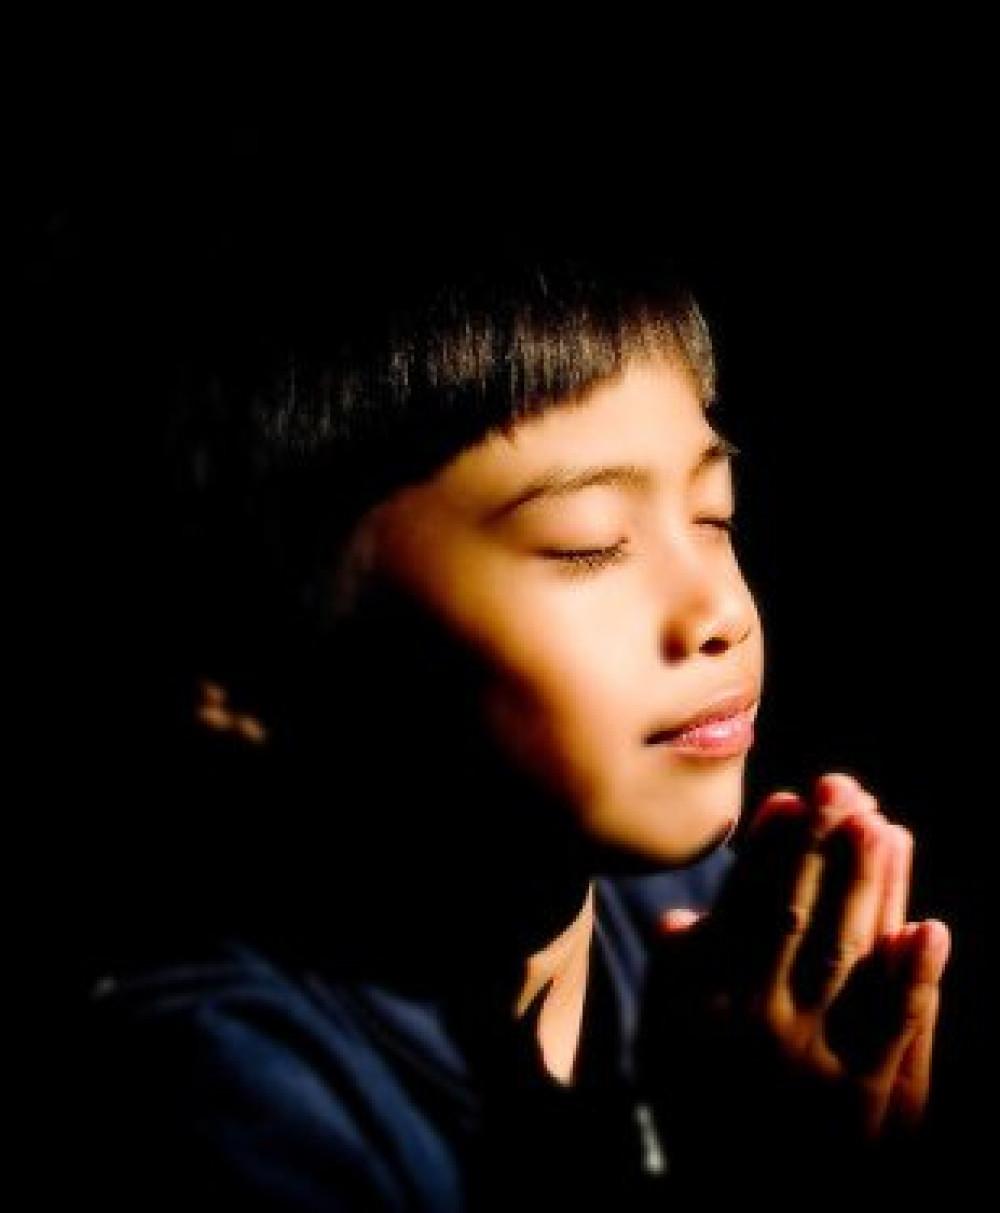 9 Ways to Foster Kids' Spirituality